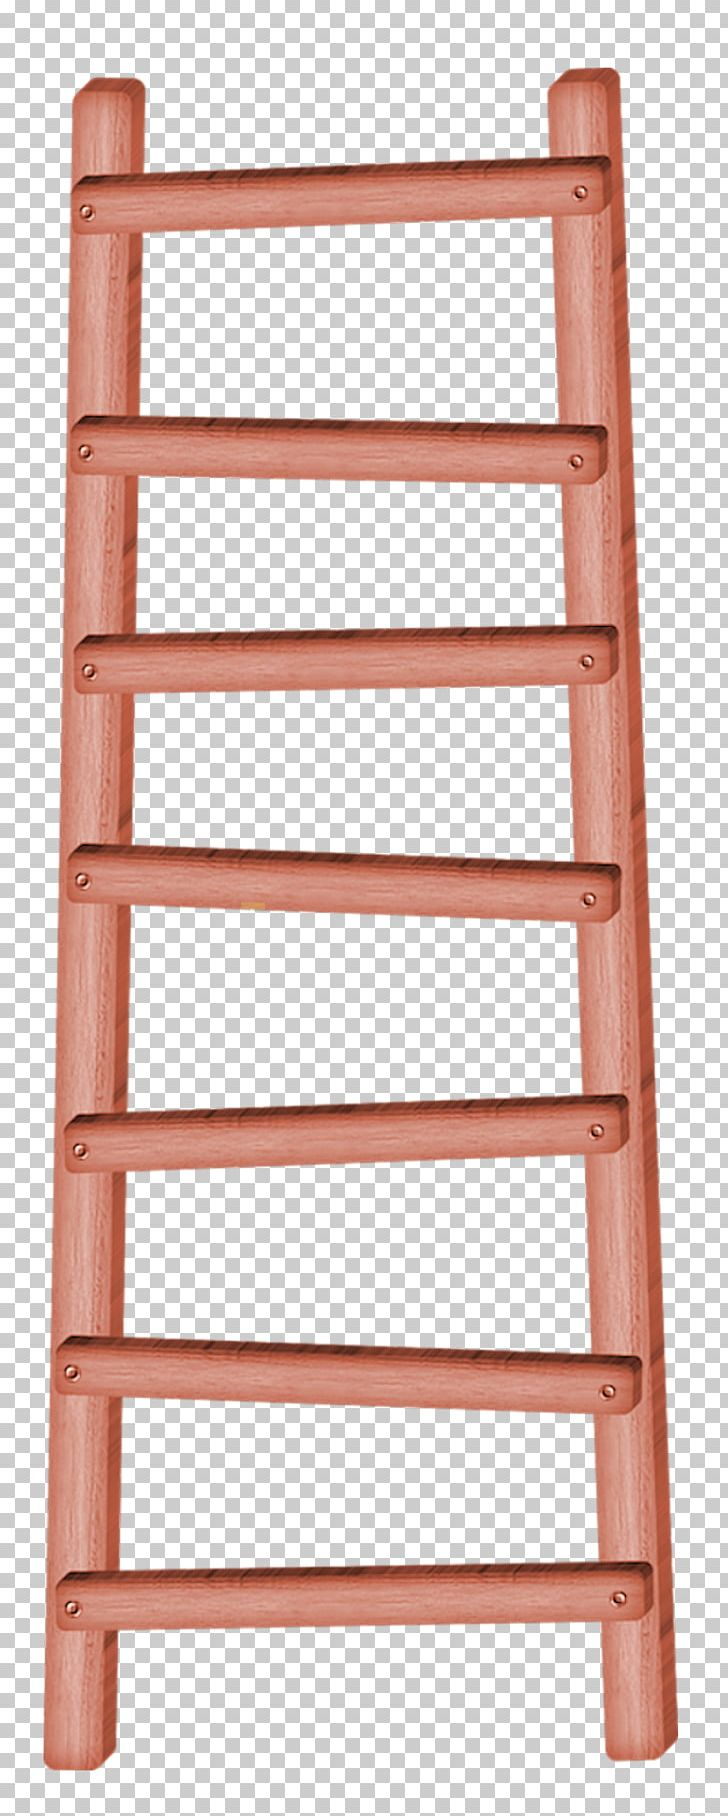 Ladder PNG, Clipart, Ladder Free PNG Download.